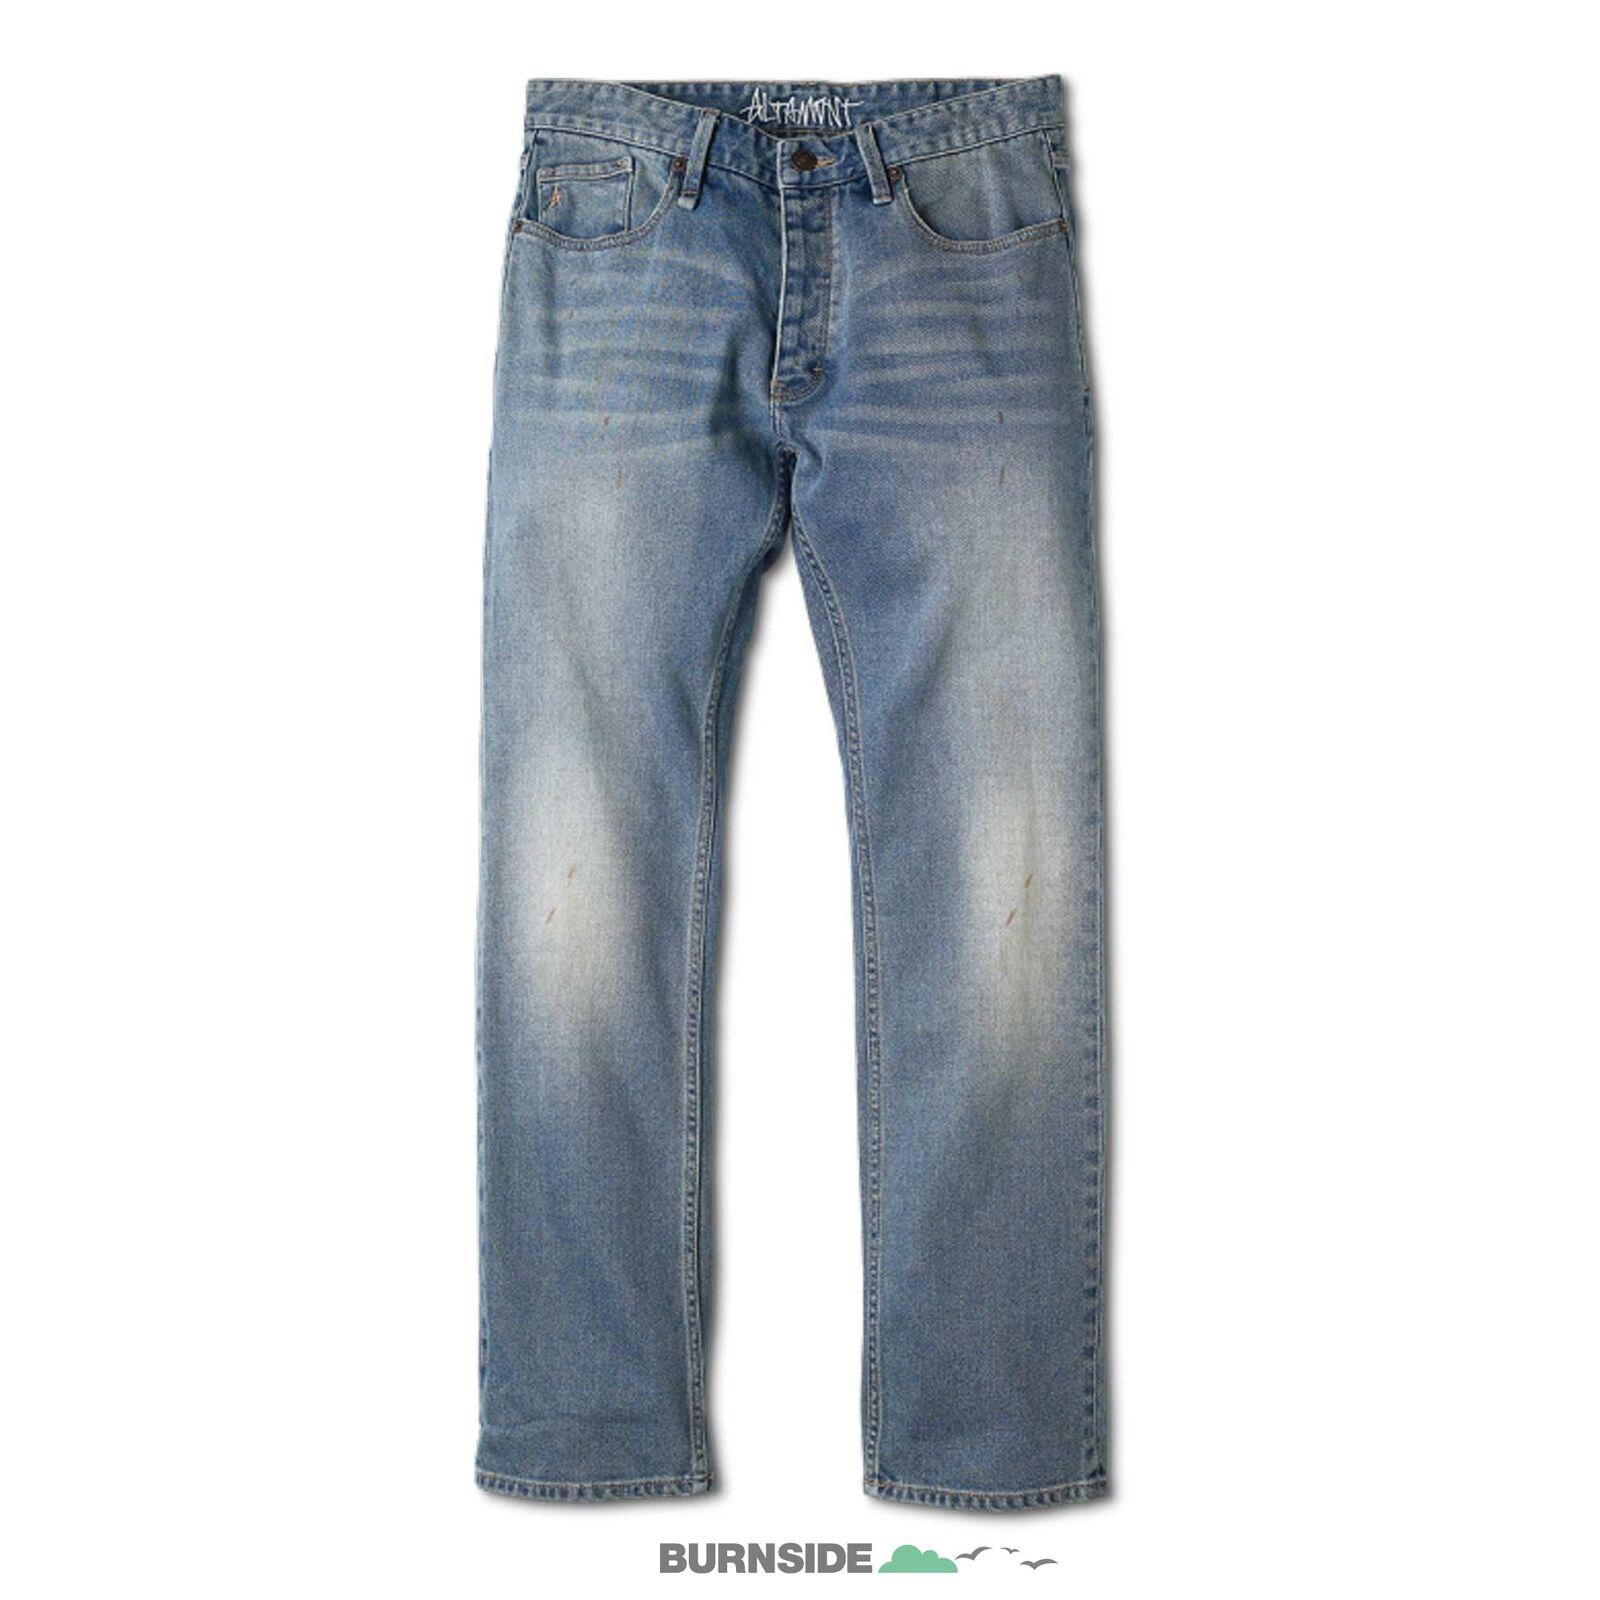 ALTAMONT Pant WILSHIRE STRAIGHT DENIM SP 14  Lange Jeans Hose Denim